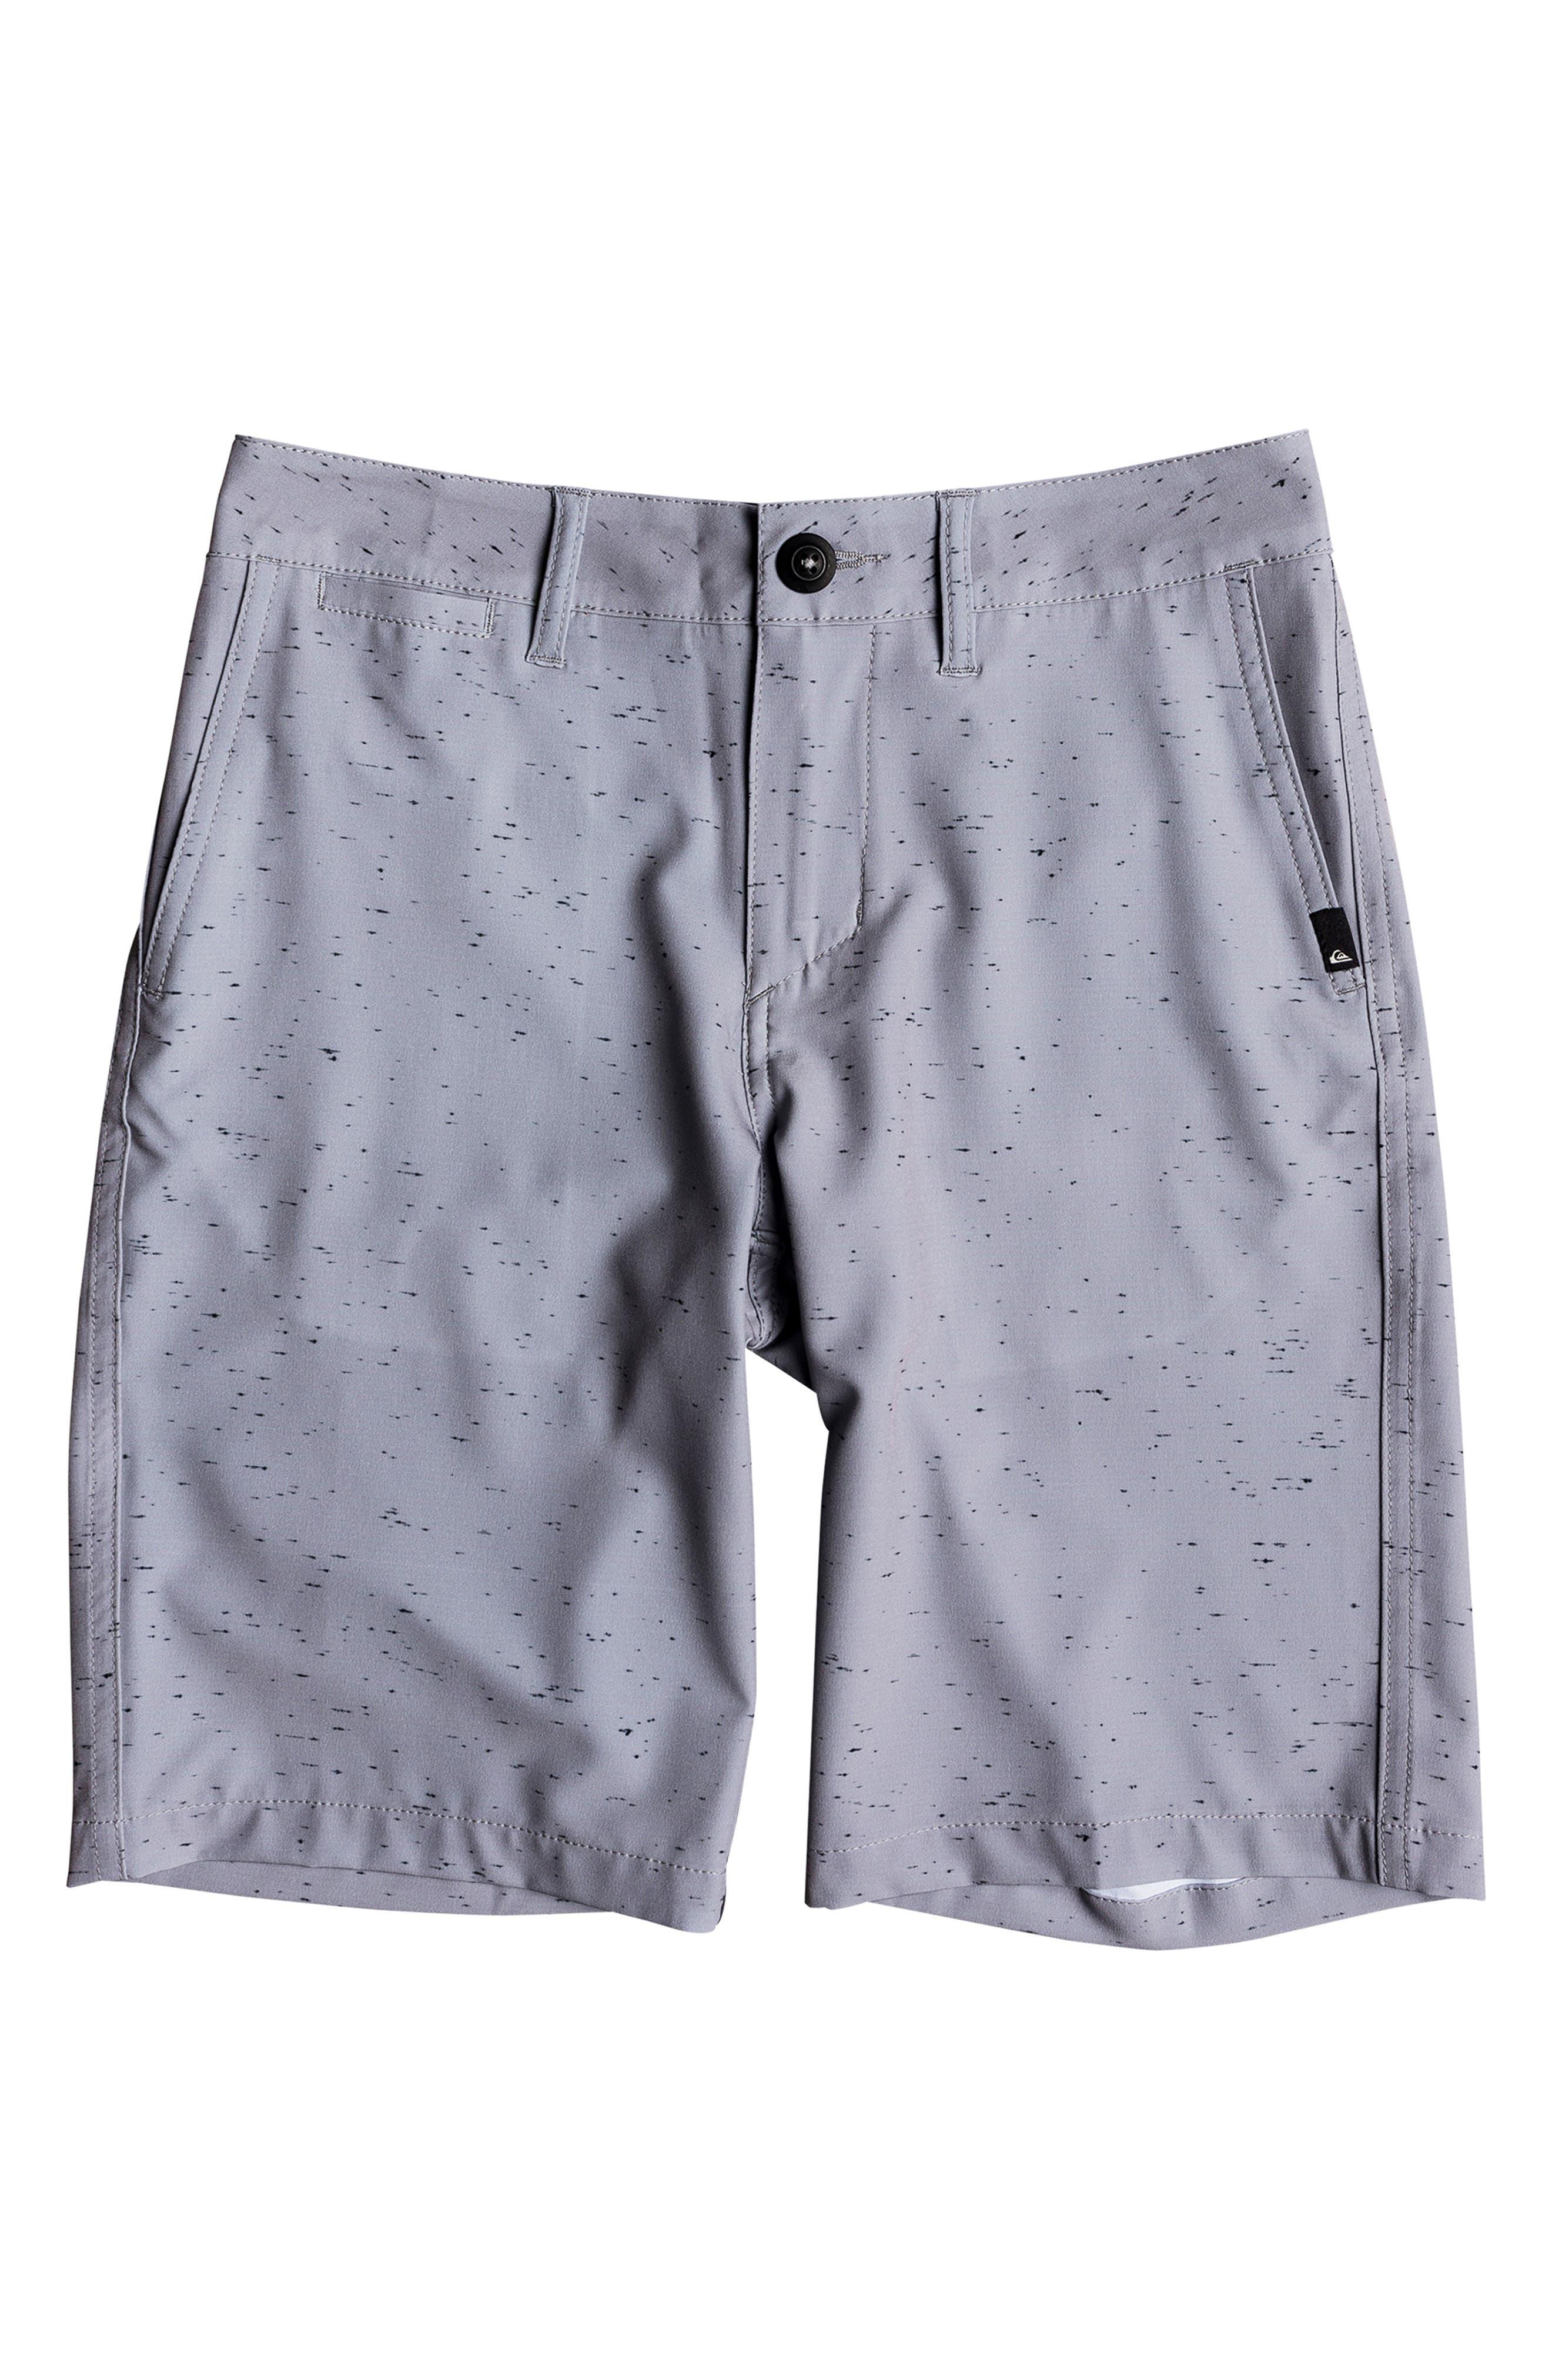 Union Nep Amphibian Hybrid Shorts,                         Main,                         color, PLAGE